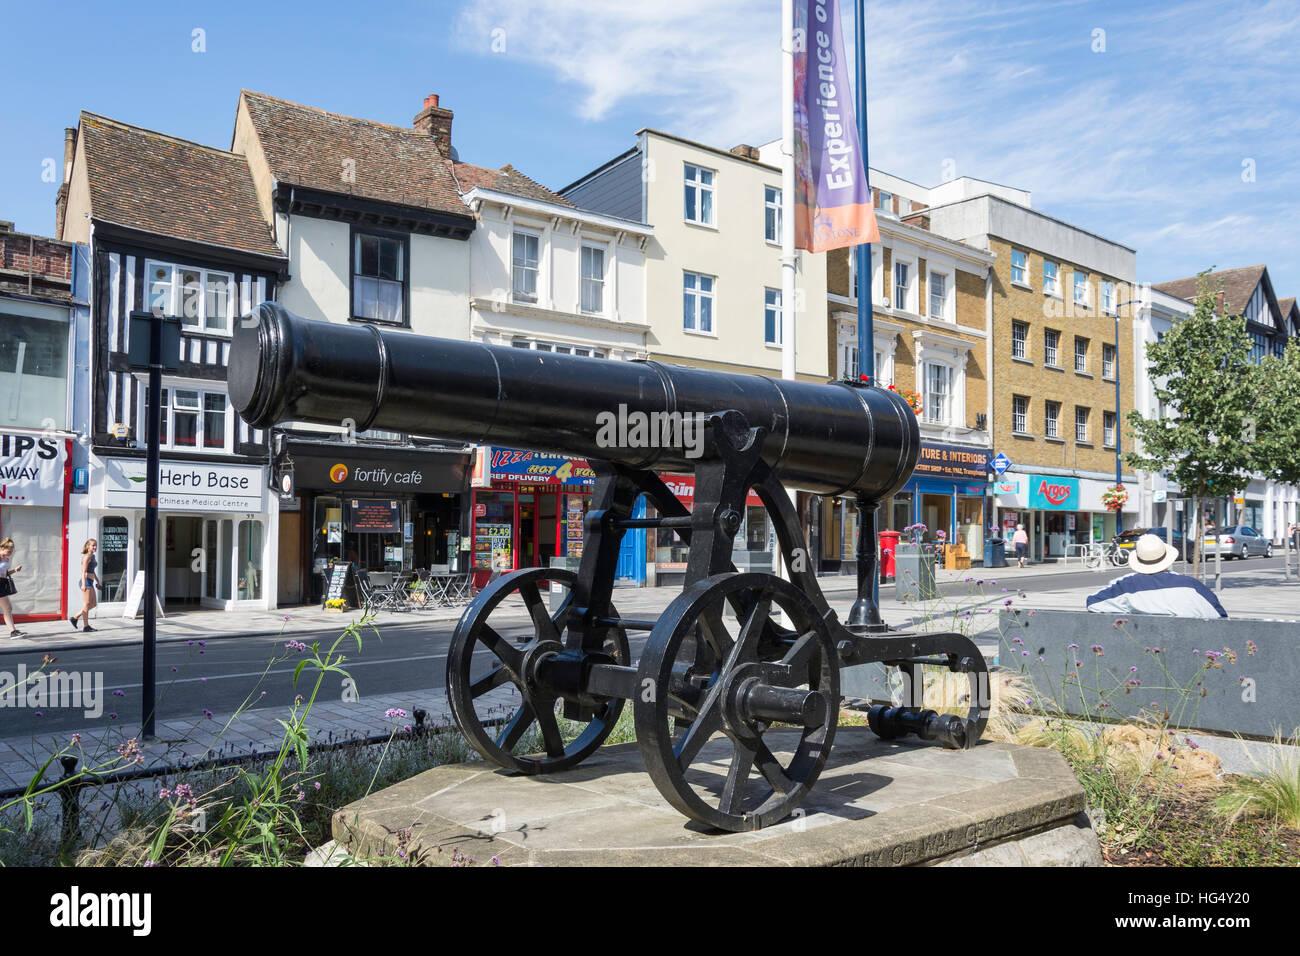 Canon in Rememberance Square, Maidstone, Kent, England, United Kingdom Stock Photo